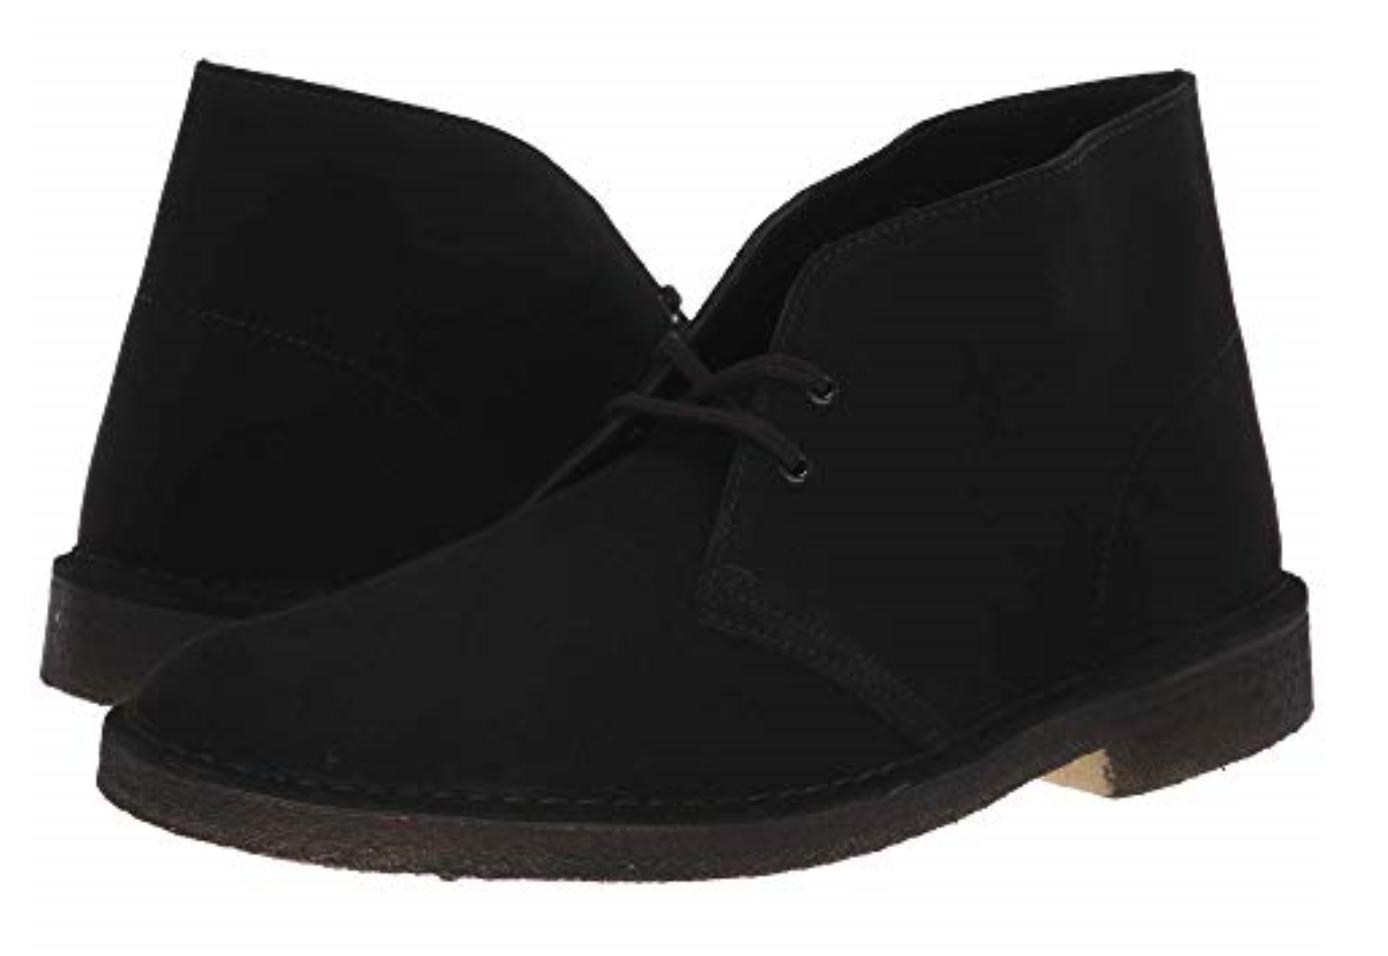 Clarks Desert Boot - Originals Mens Black Suede Shoes